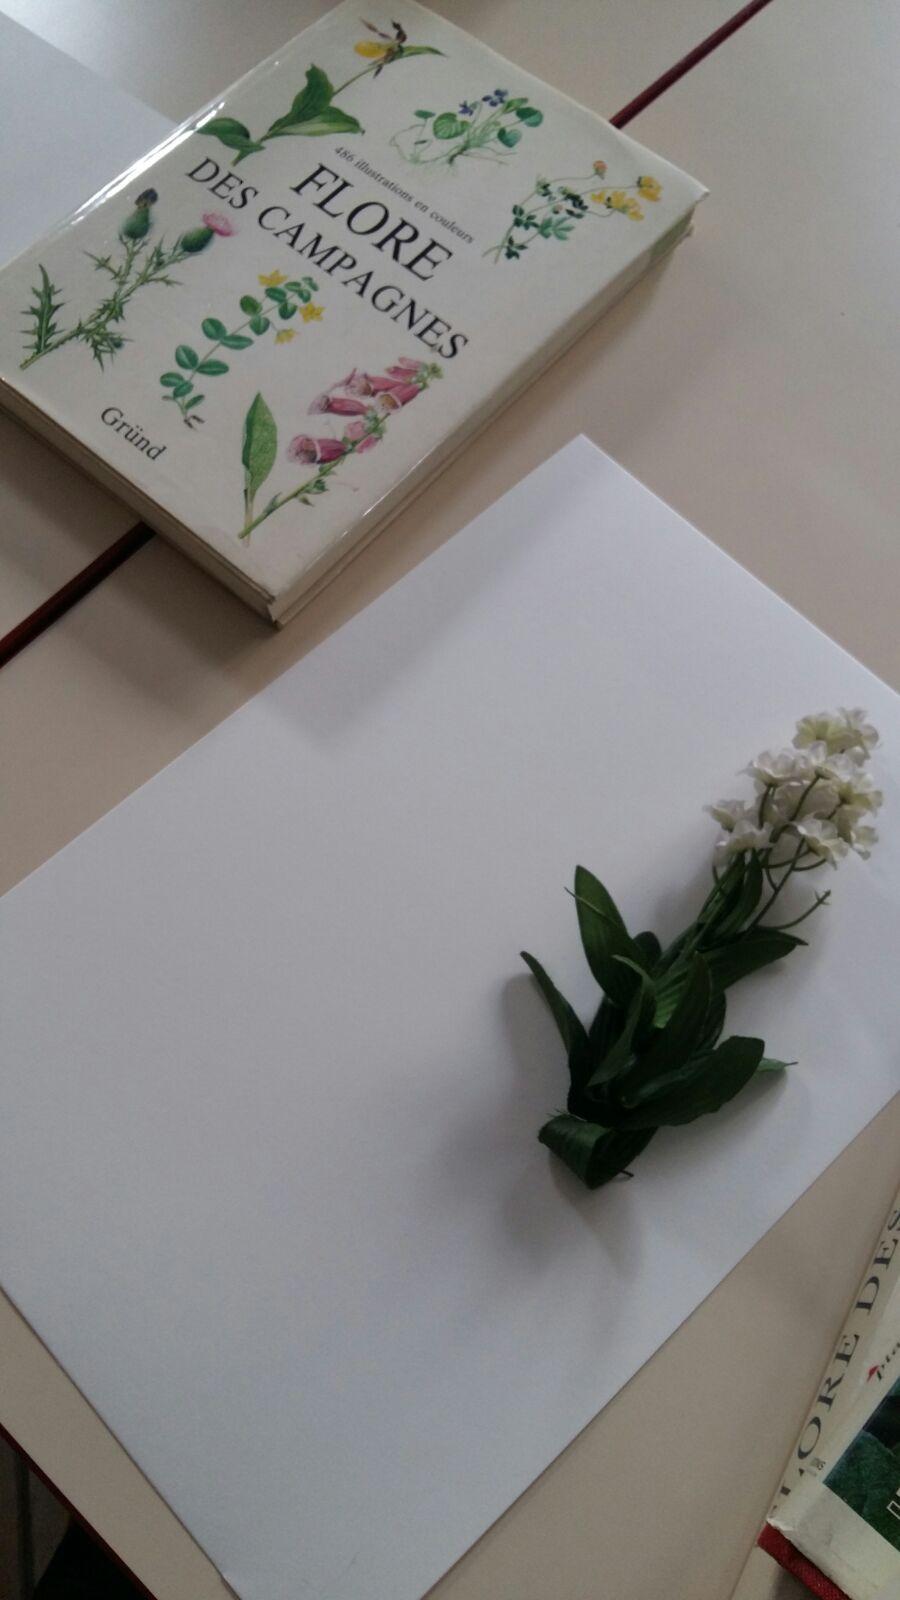 herbier-artificiel2-ingrid-paola-amaro-2016